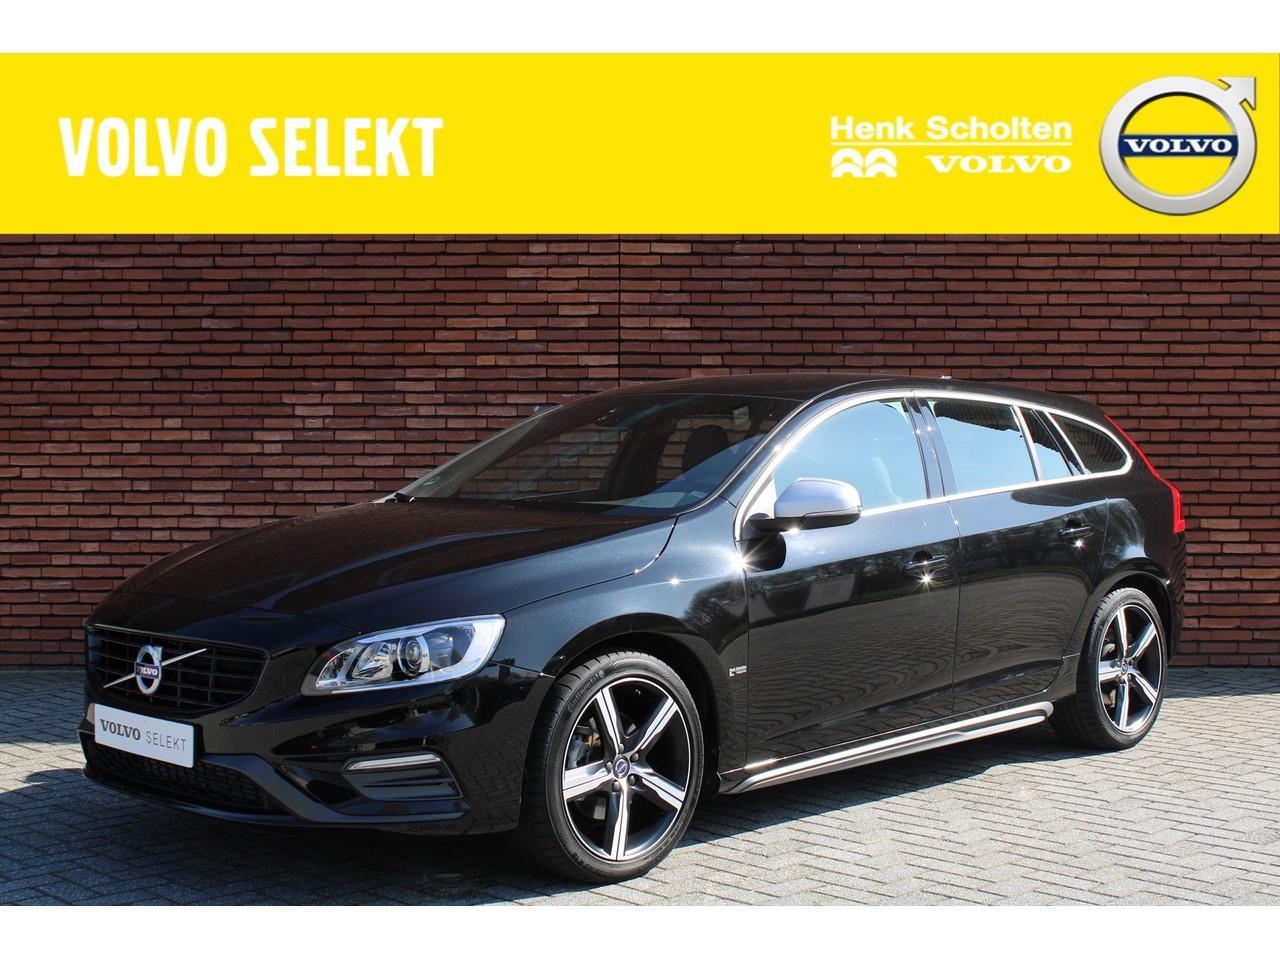 Volvo V60 D4 business sport/ scandinavian line